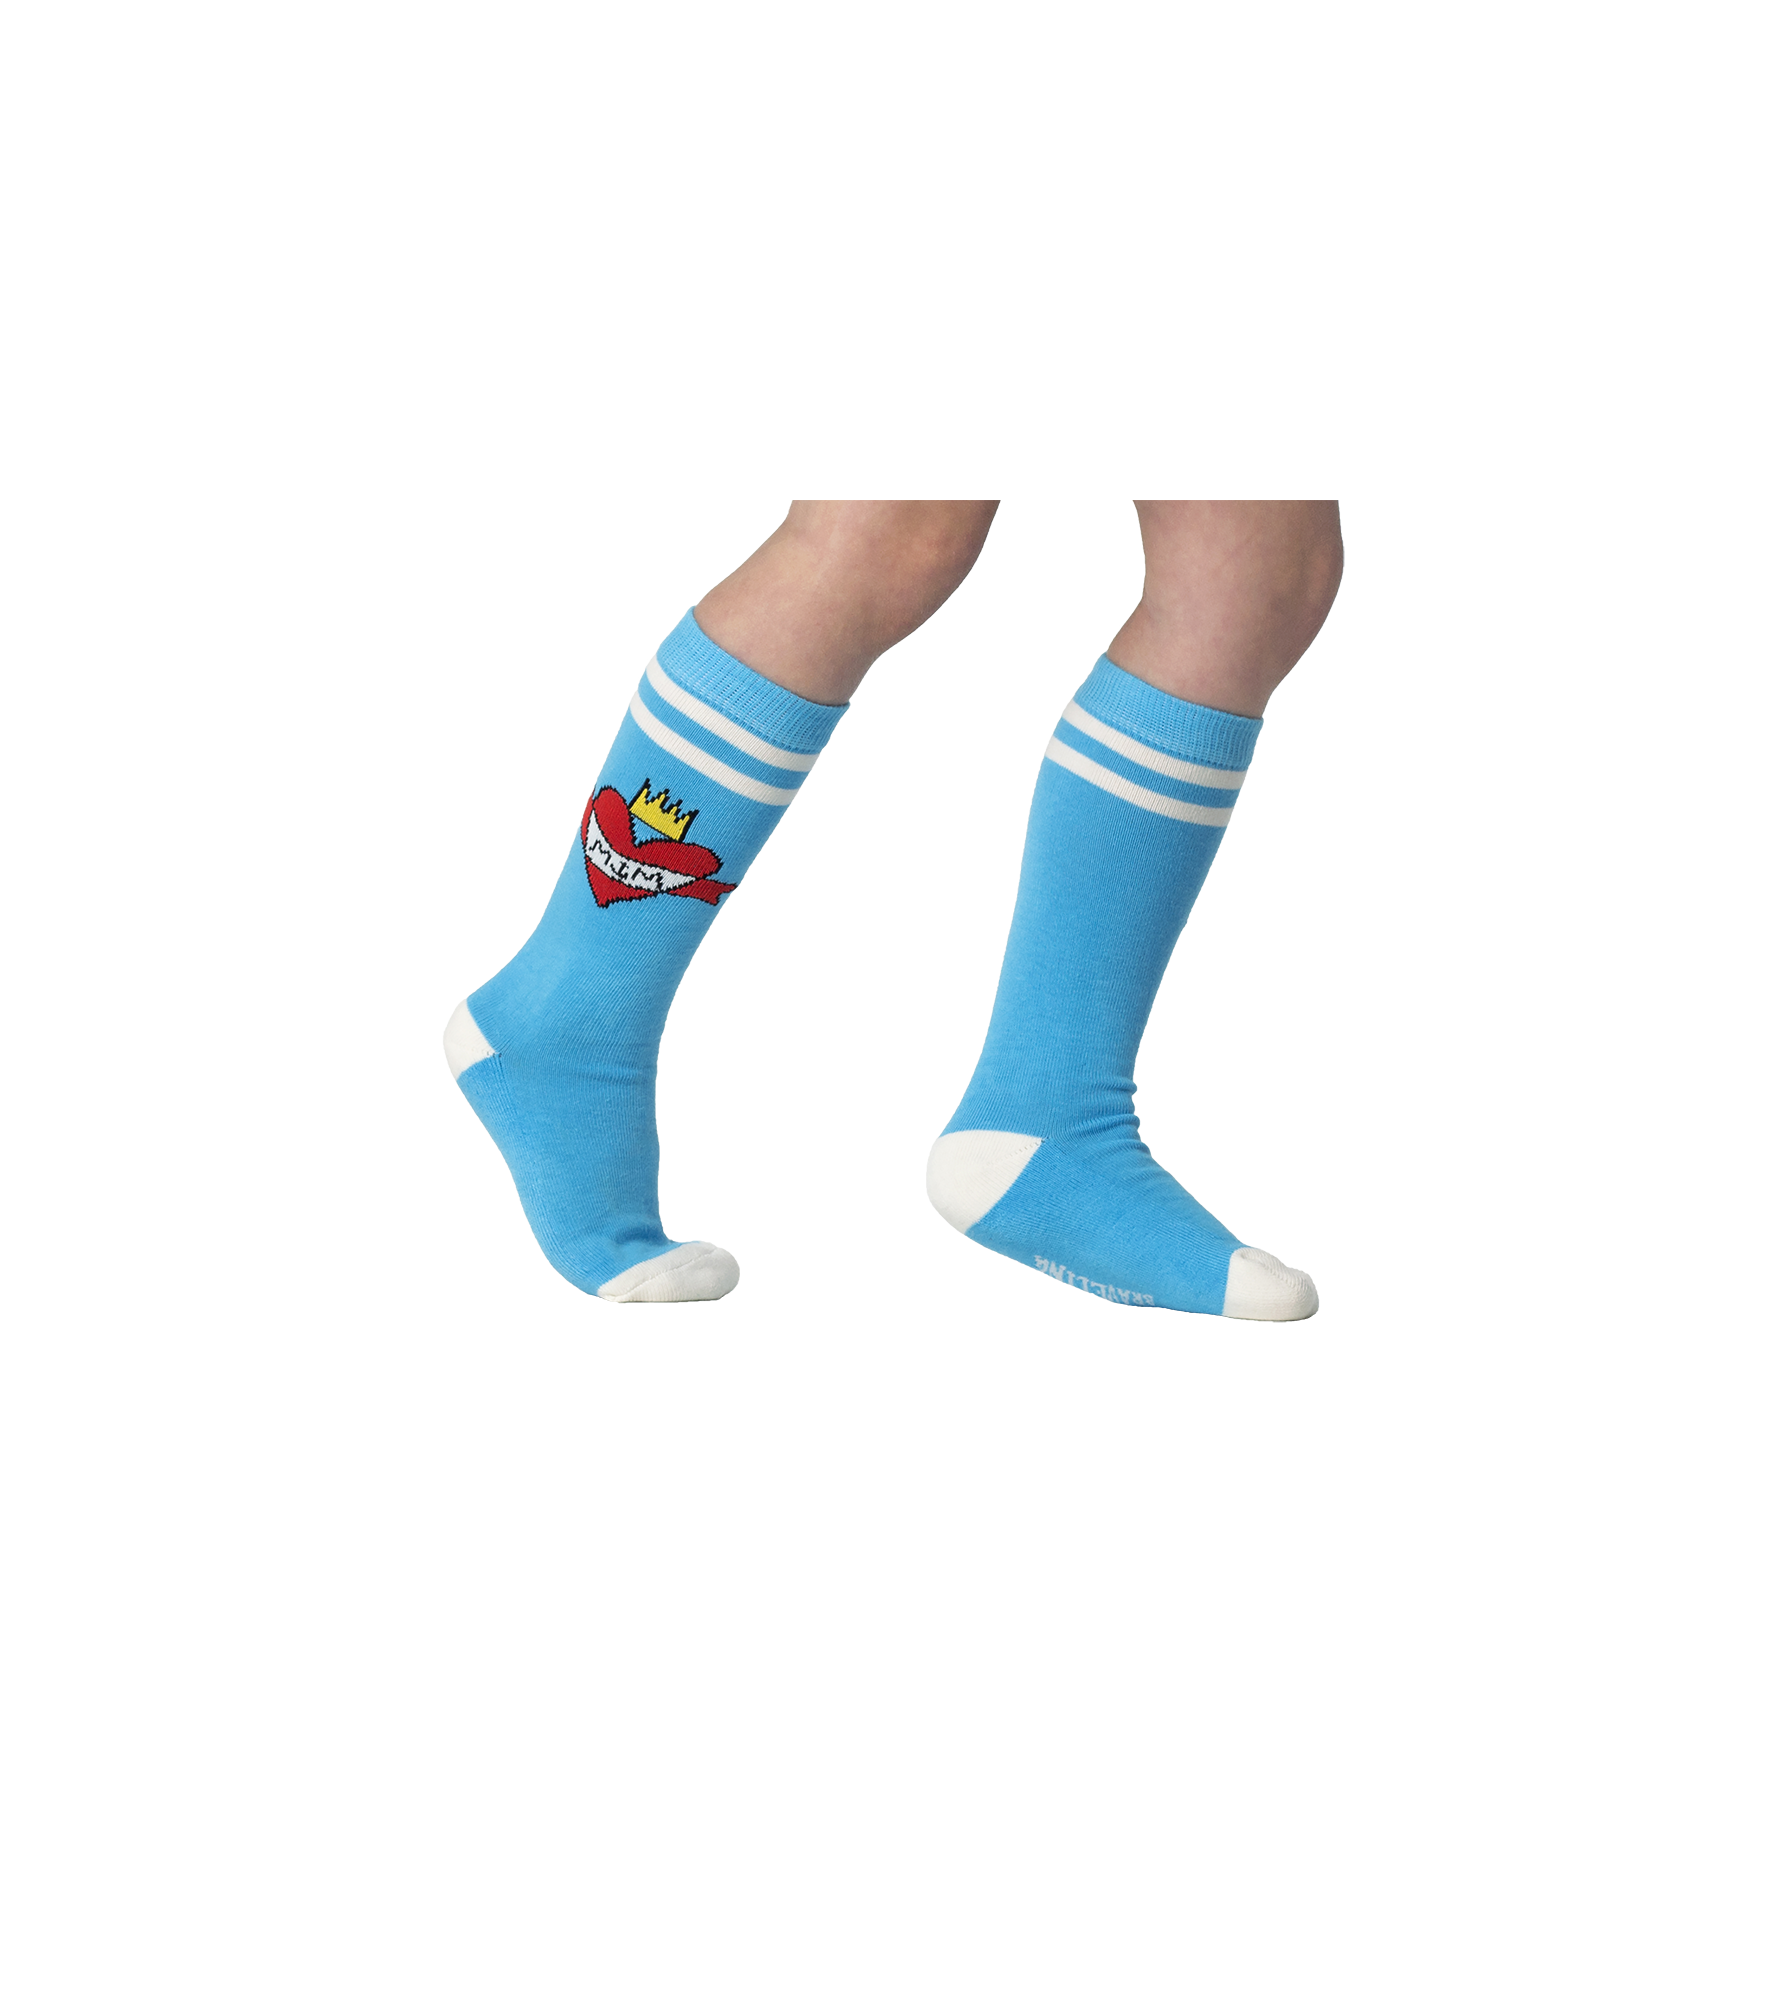 CUTOUT_Sailor Socks.png